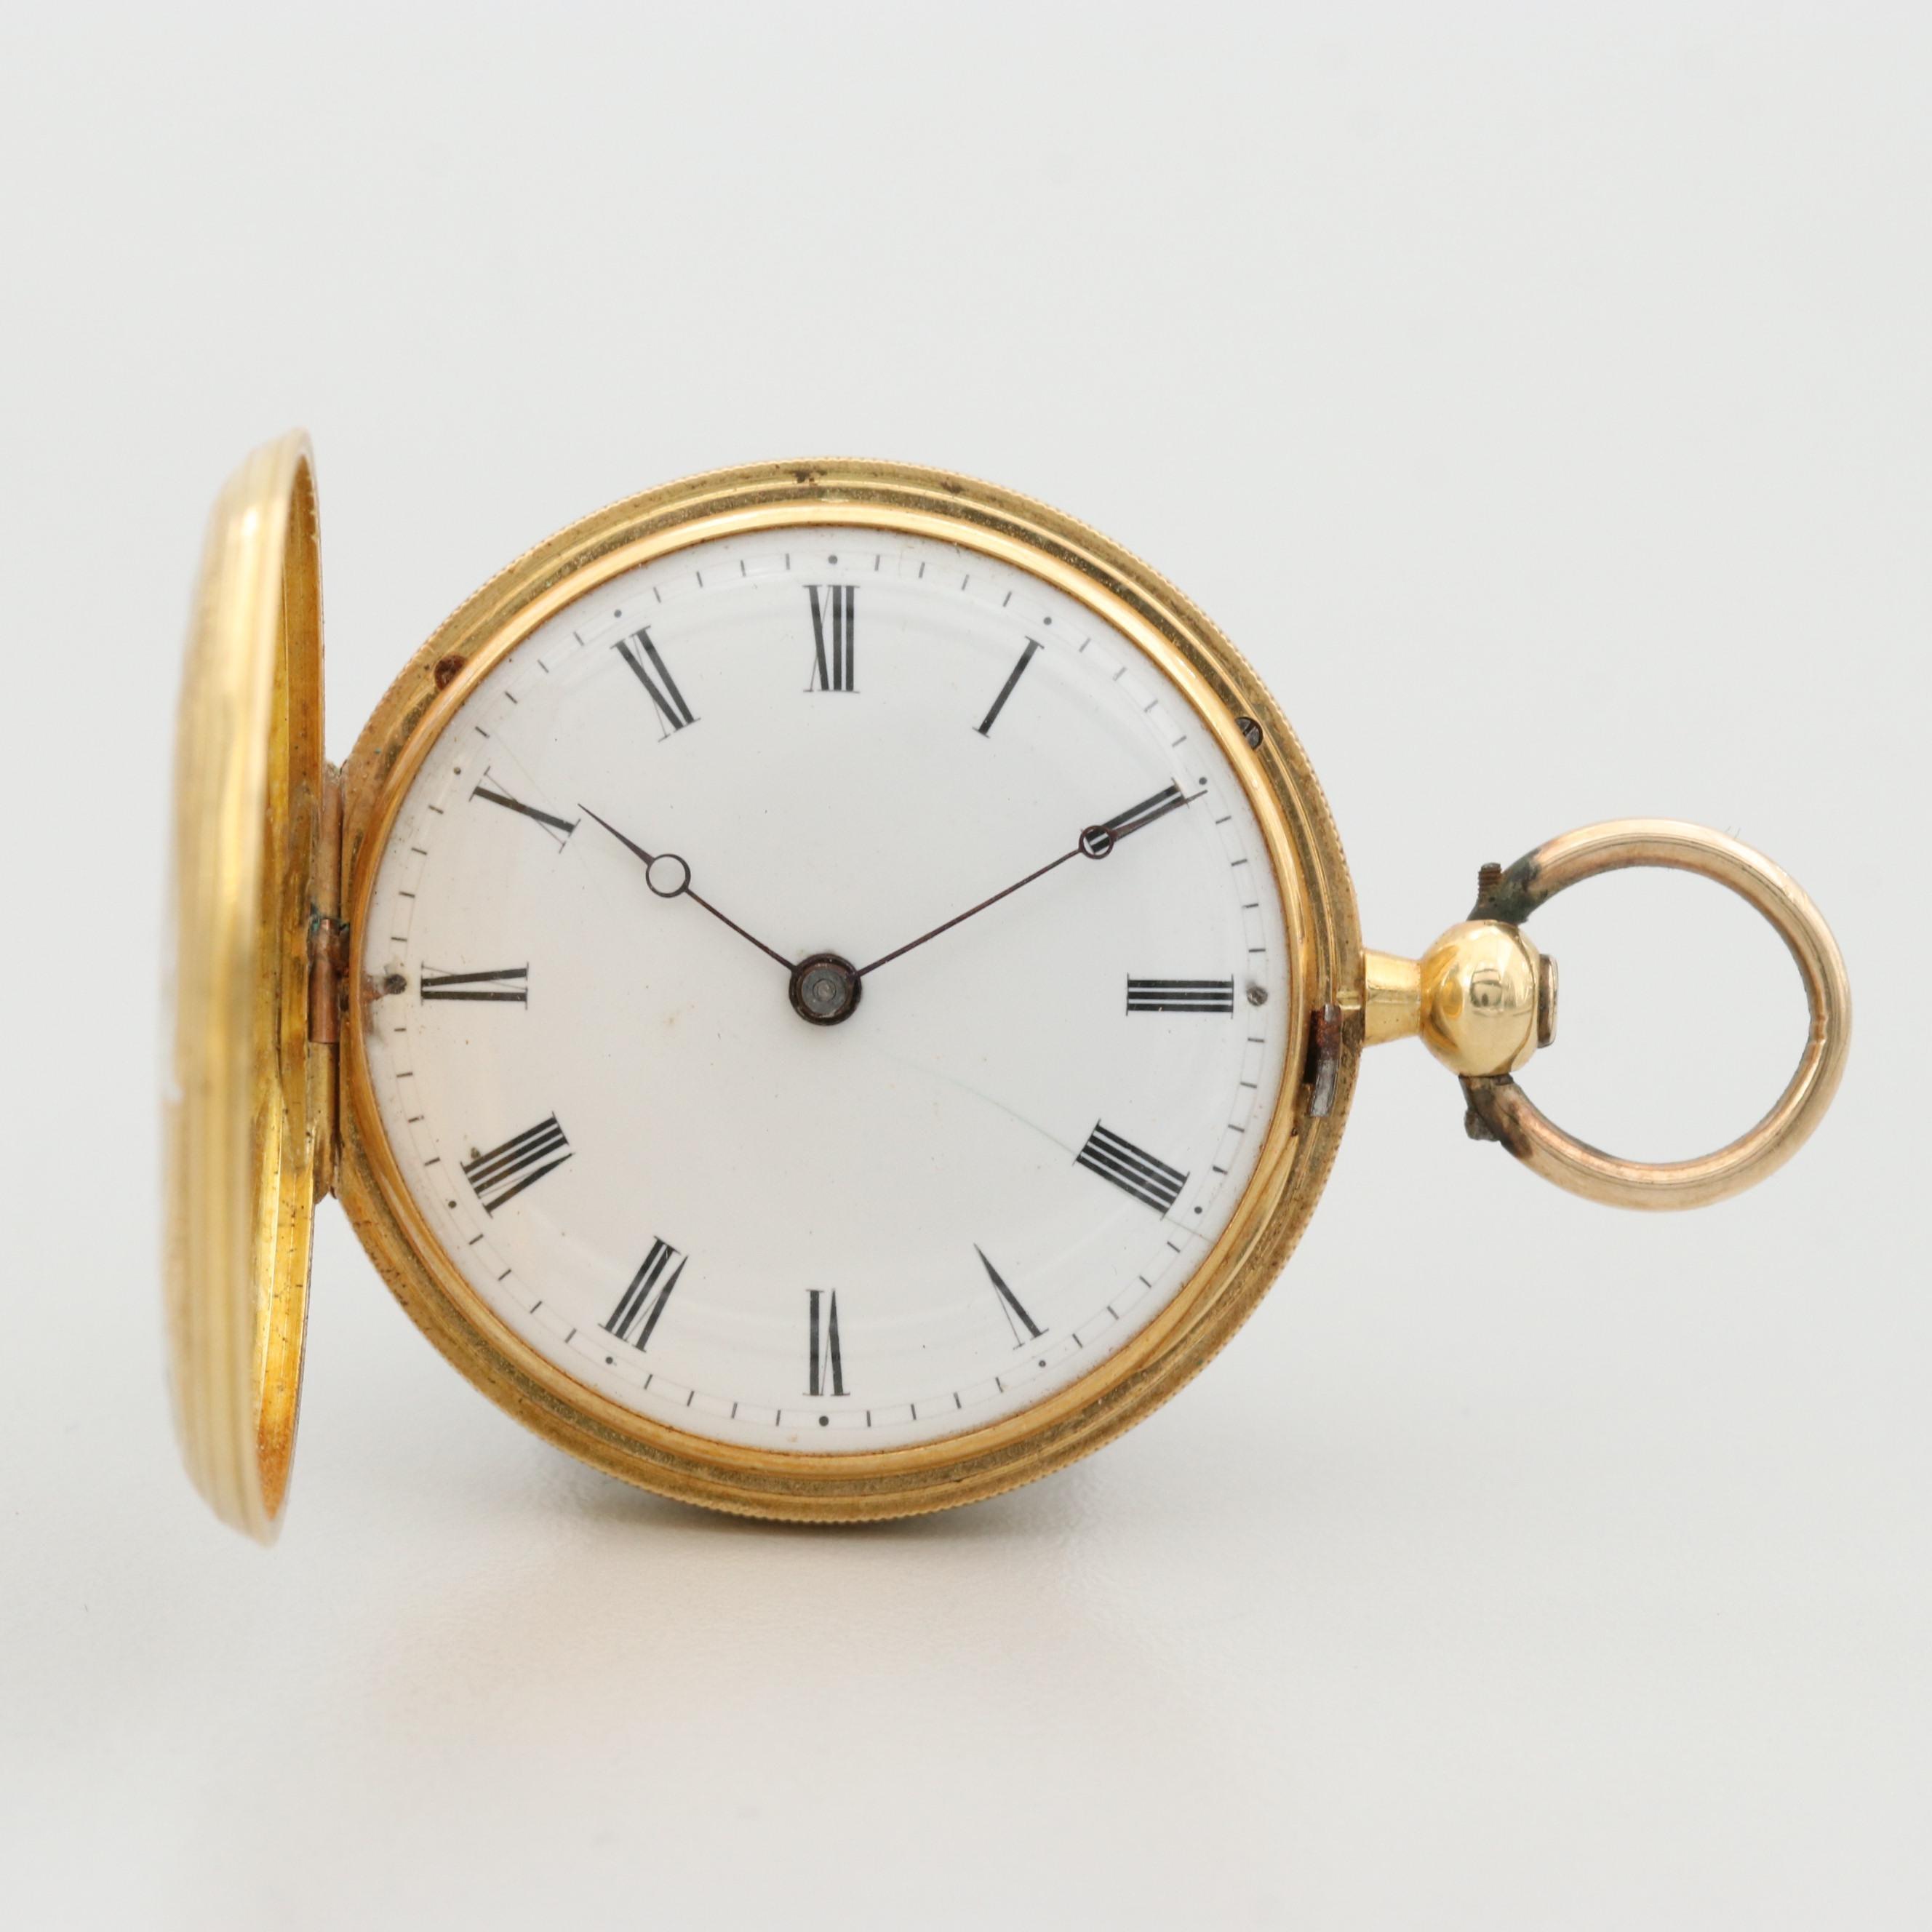 Vacheron & Constantin 18K Gold and Enamel Pocket Watch